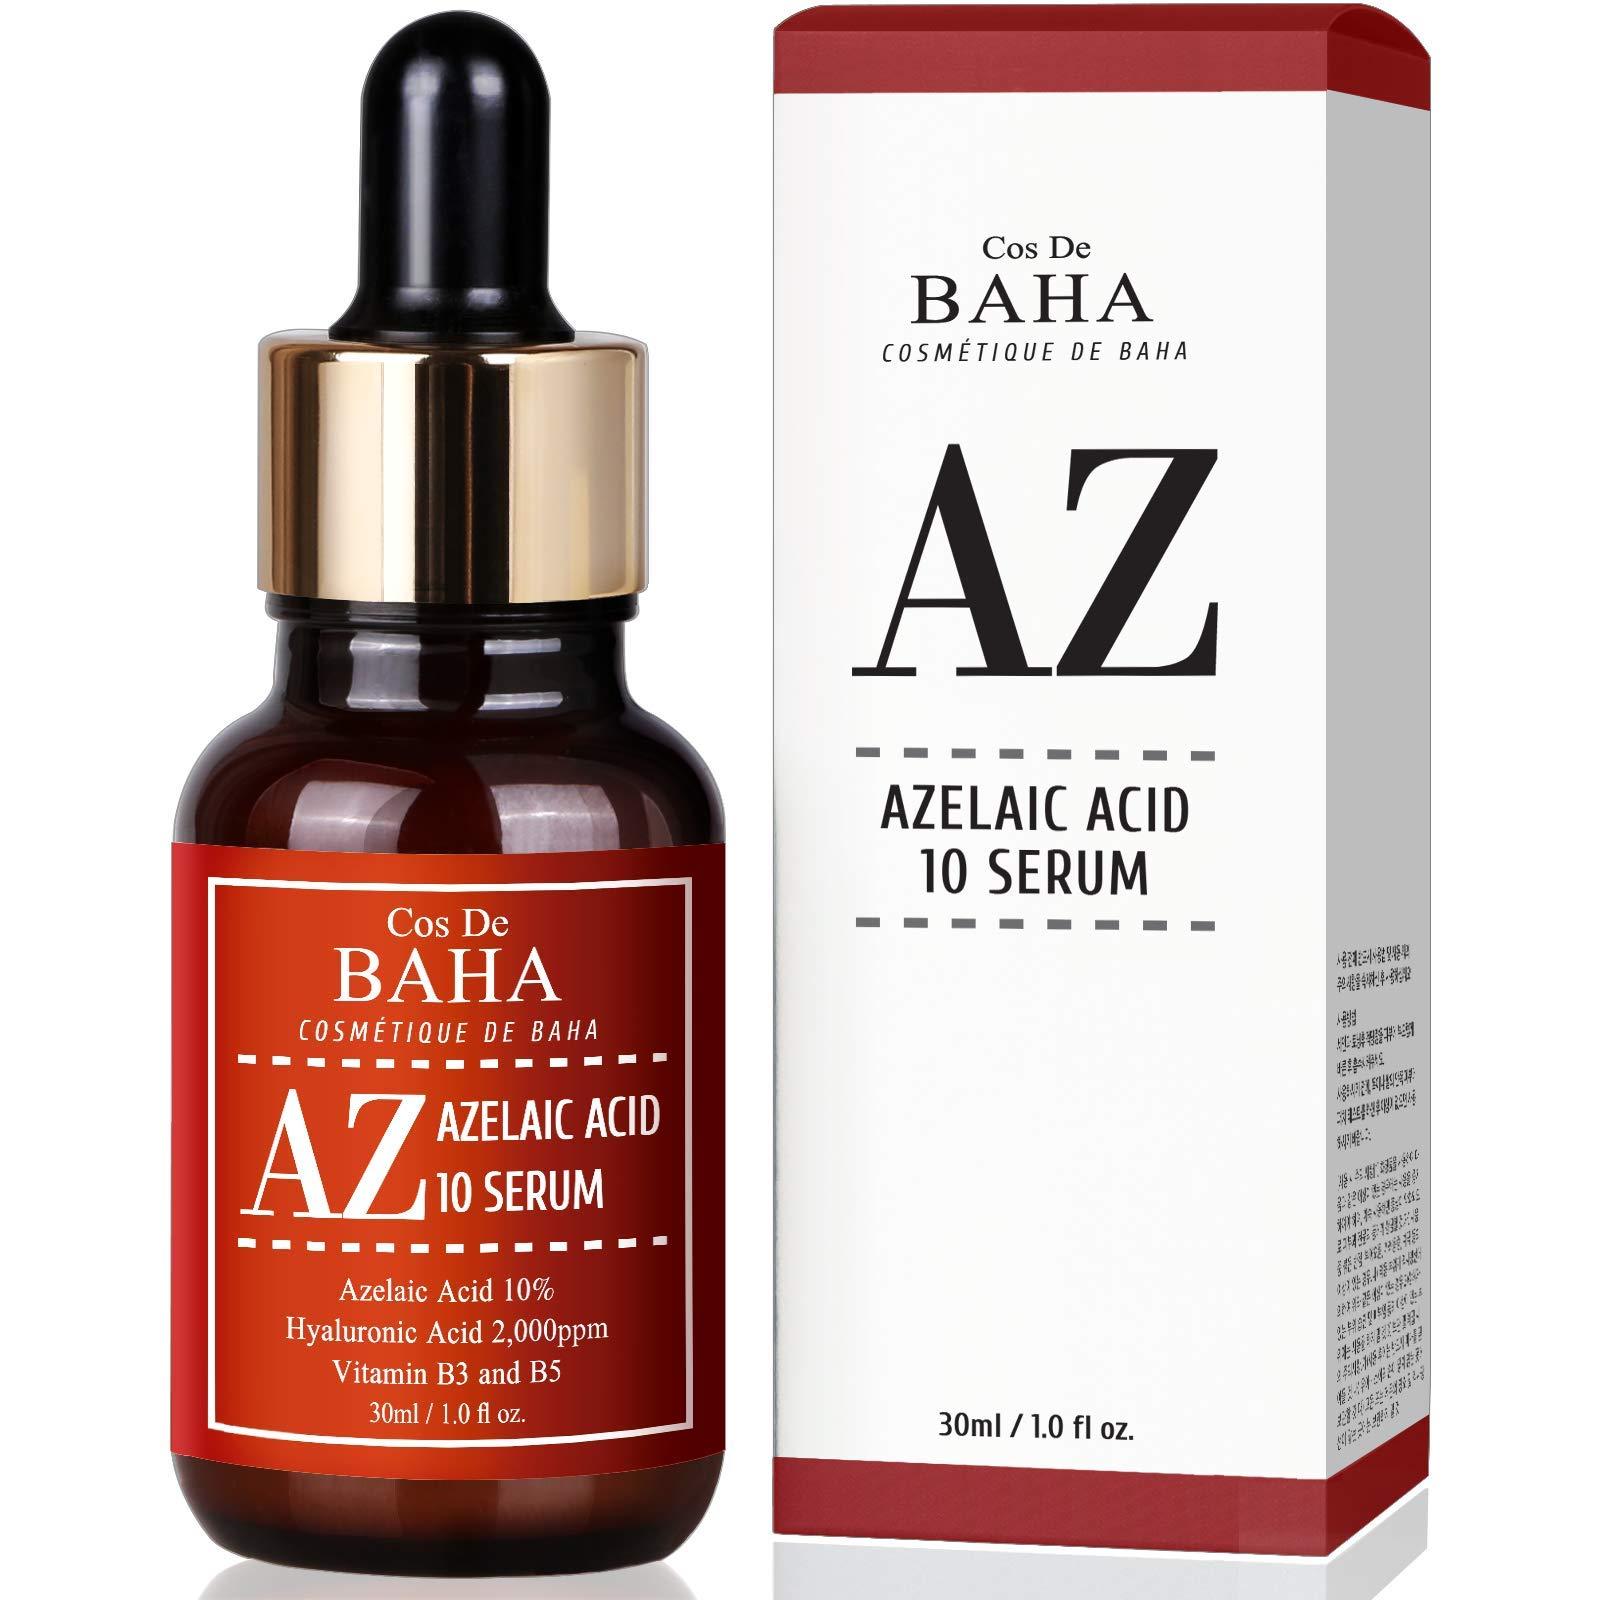 Azelaic Acid 10% Facial Serum with Niacinamide - Fast Rosacea Skin Care Product + Reduce Cystic Acne Scar + Redness Relief Face + Pimple Pigmentation Blackhead, Alcohol Free, 1oz (30ml)